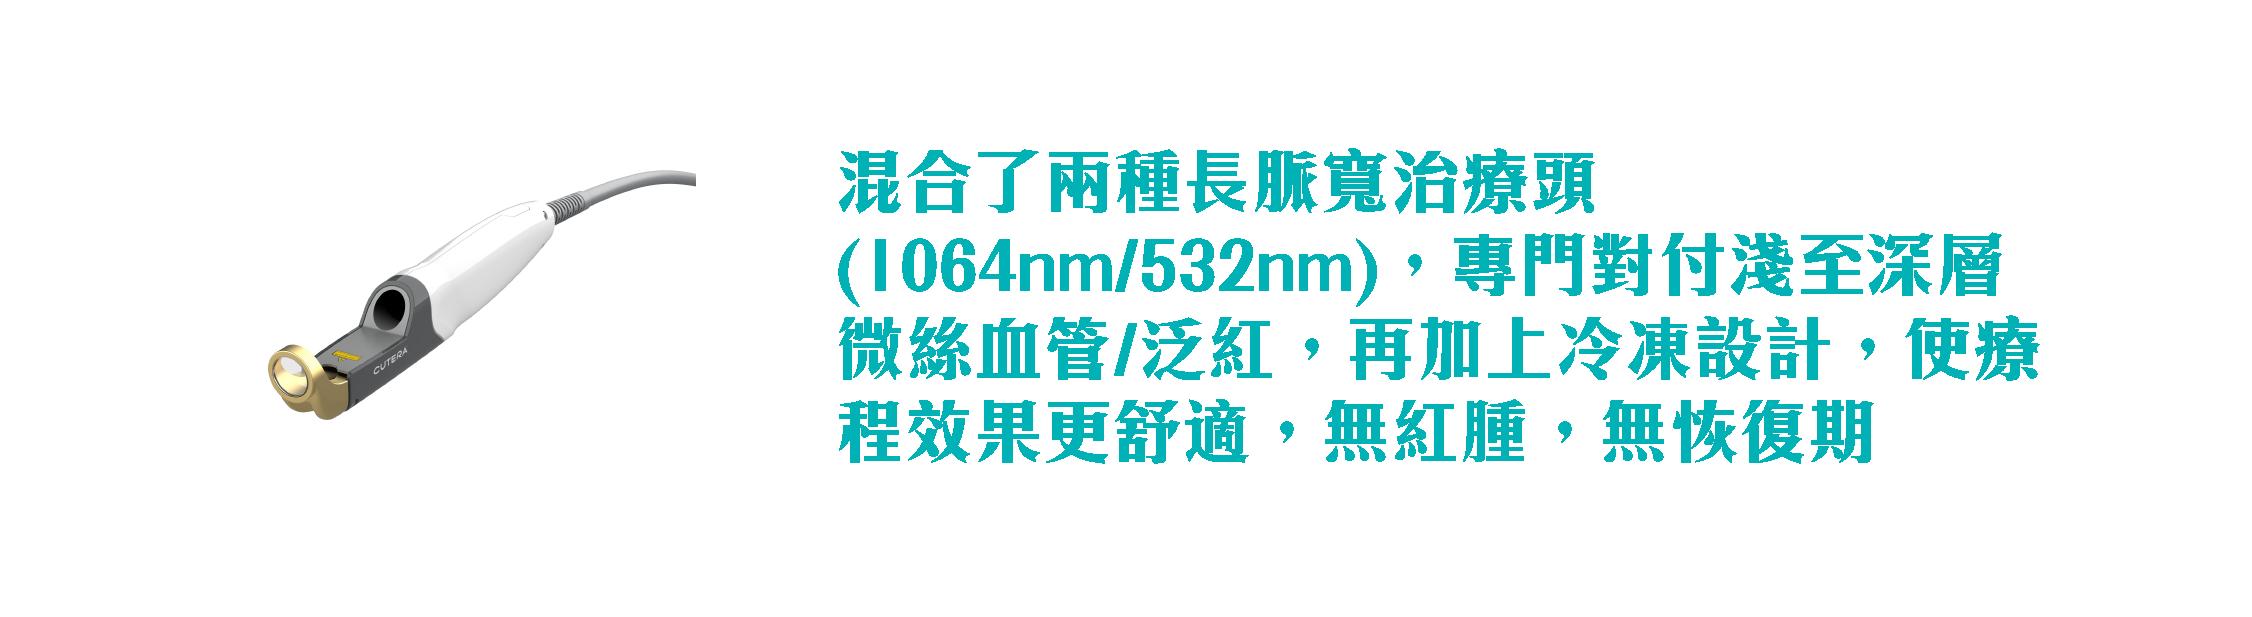 tab-03